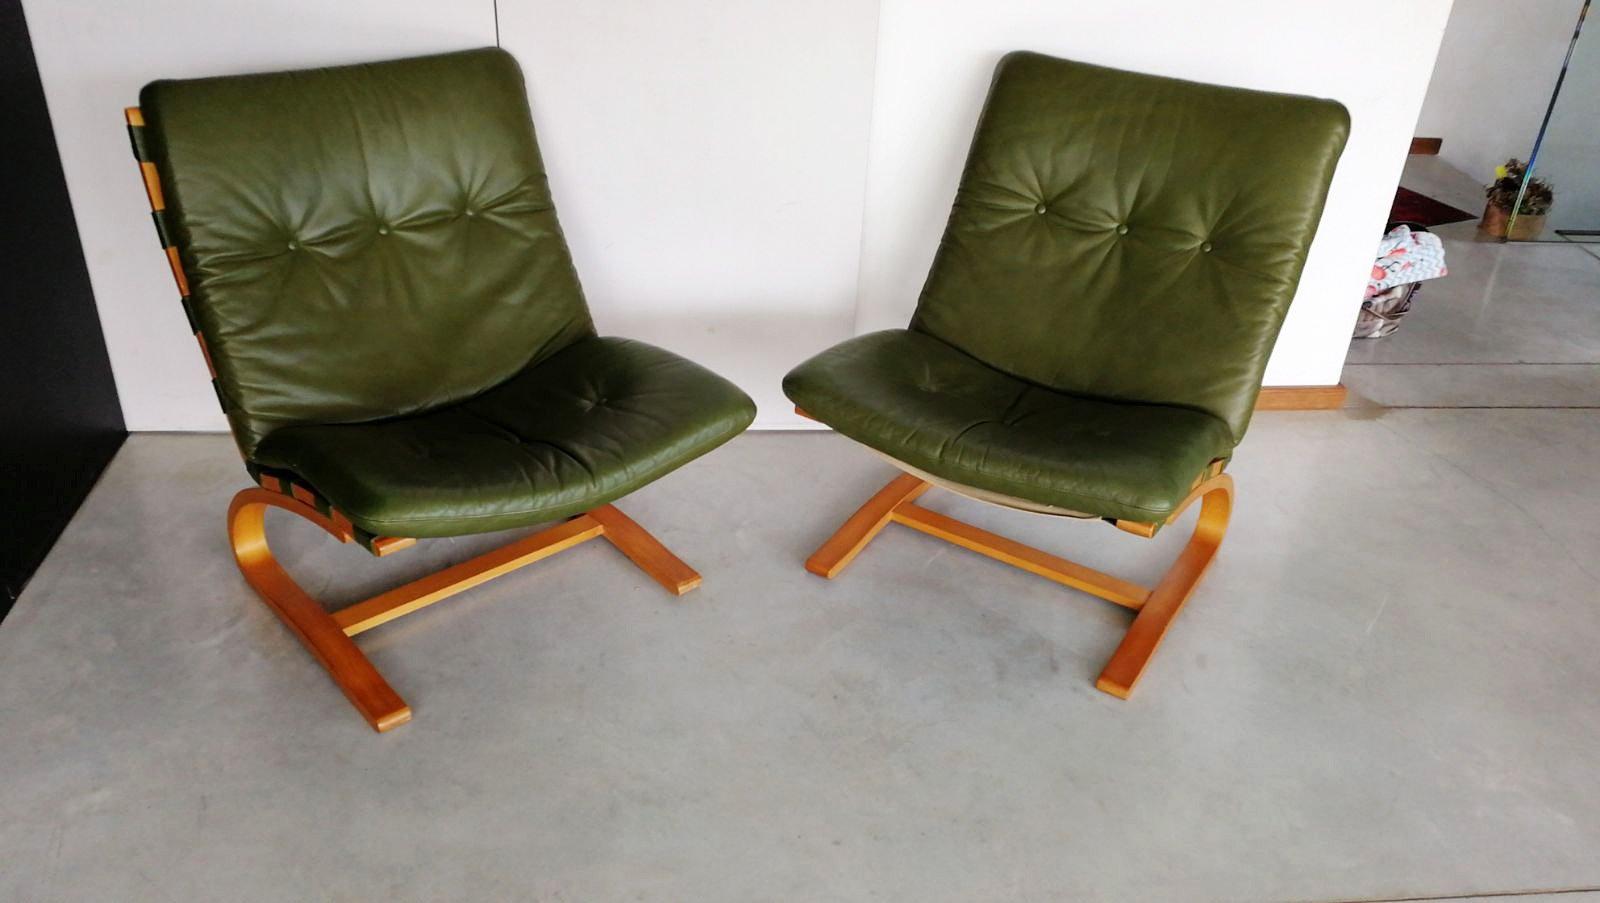 Skandinavische Sessel skandinavische sessel oddvin rykken für rybo 1960er 2er set